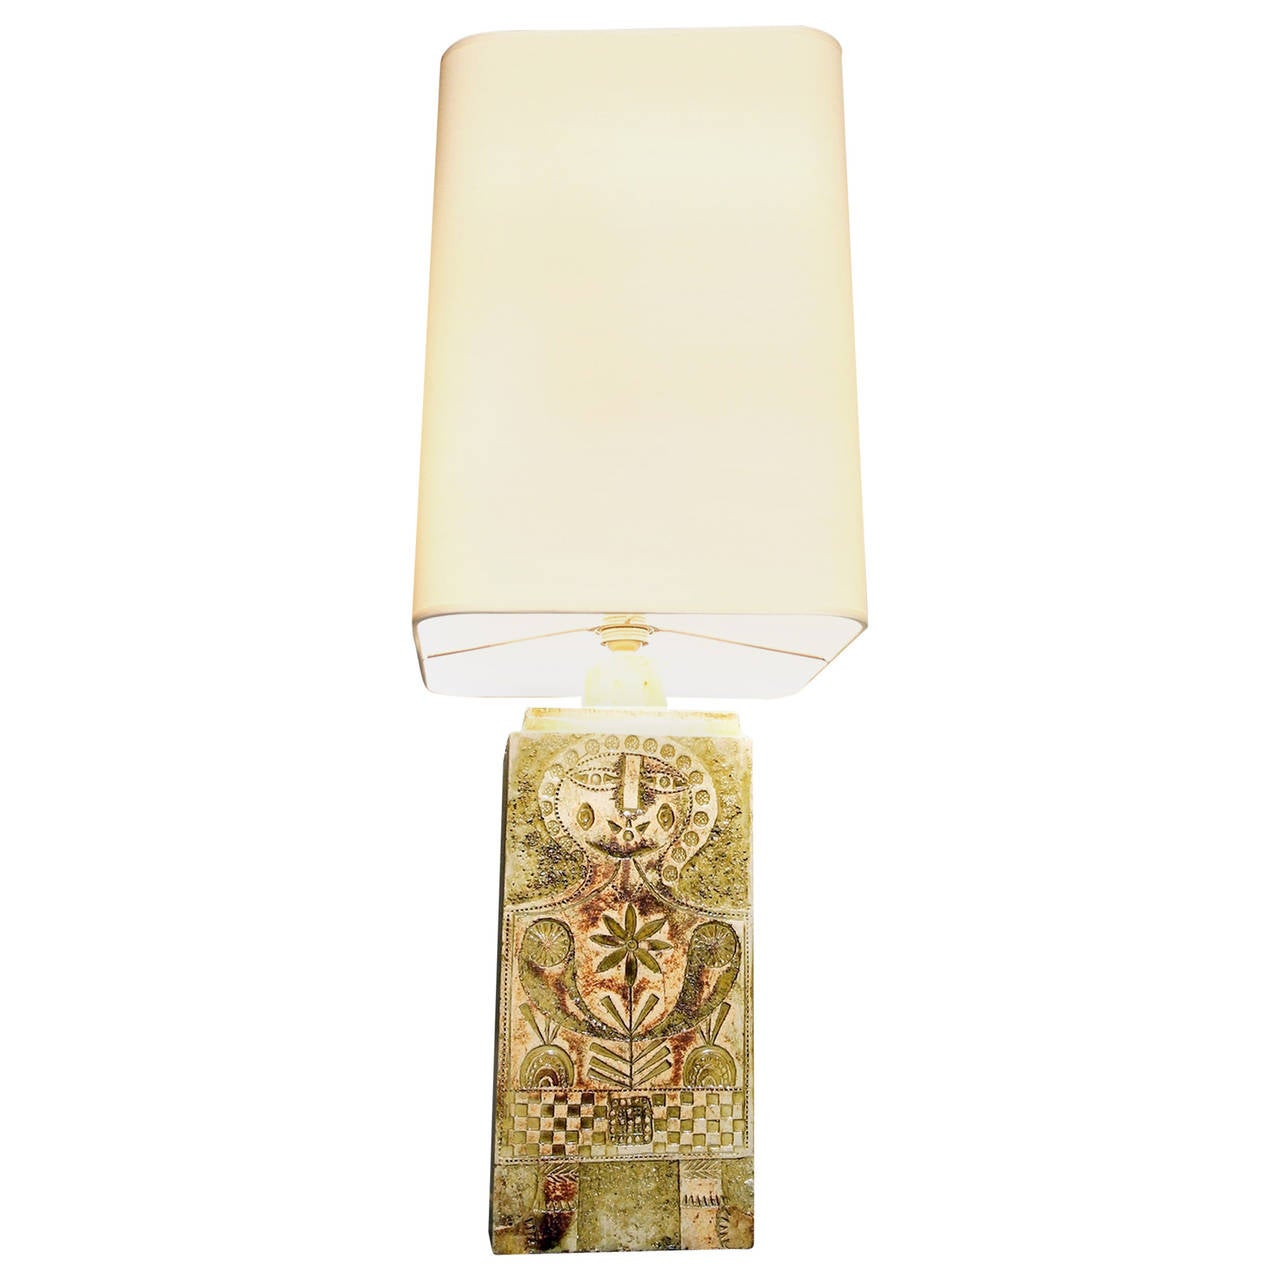 1960s Roger Capron Enameled Earthenware Table Lamp